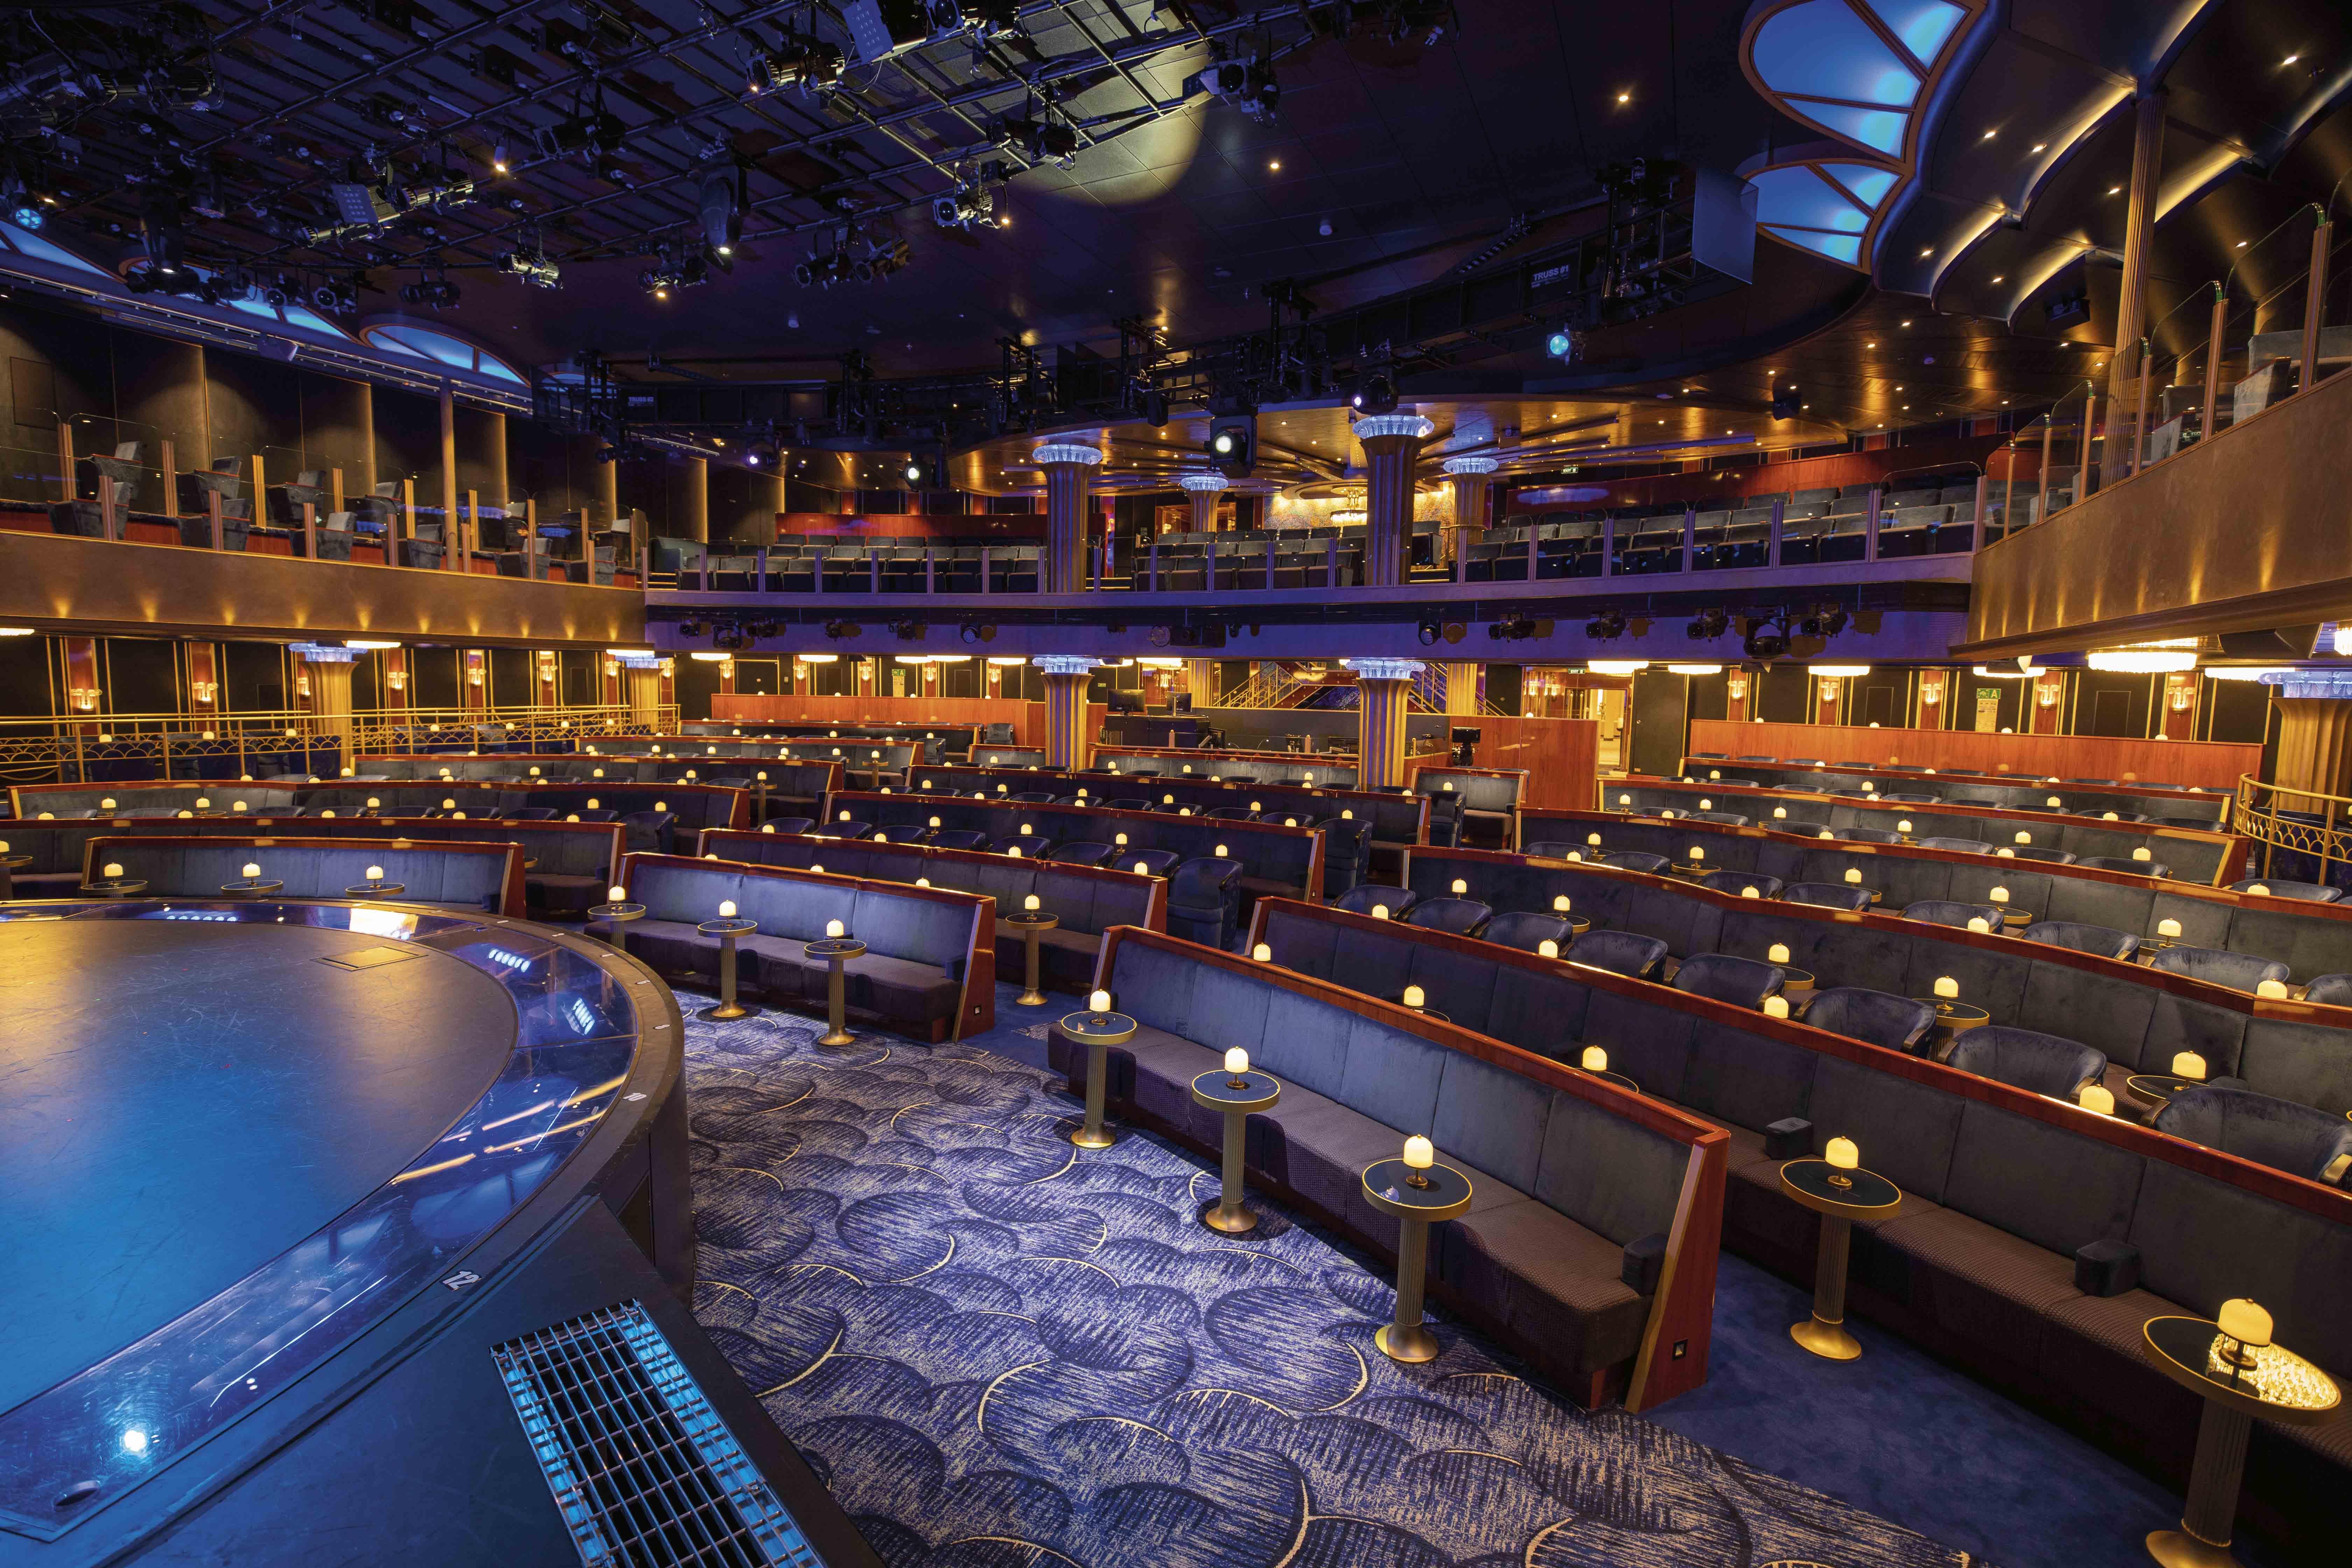 Seven Seas Splendor - Constellation Theater